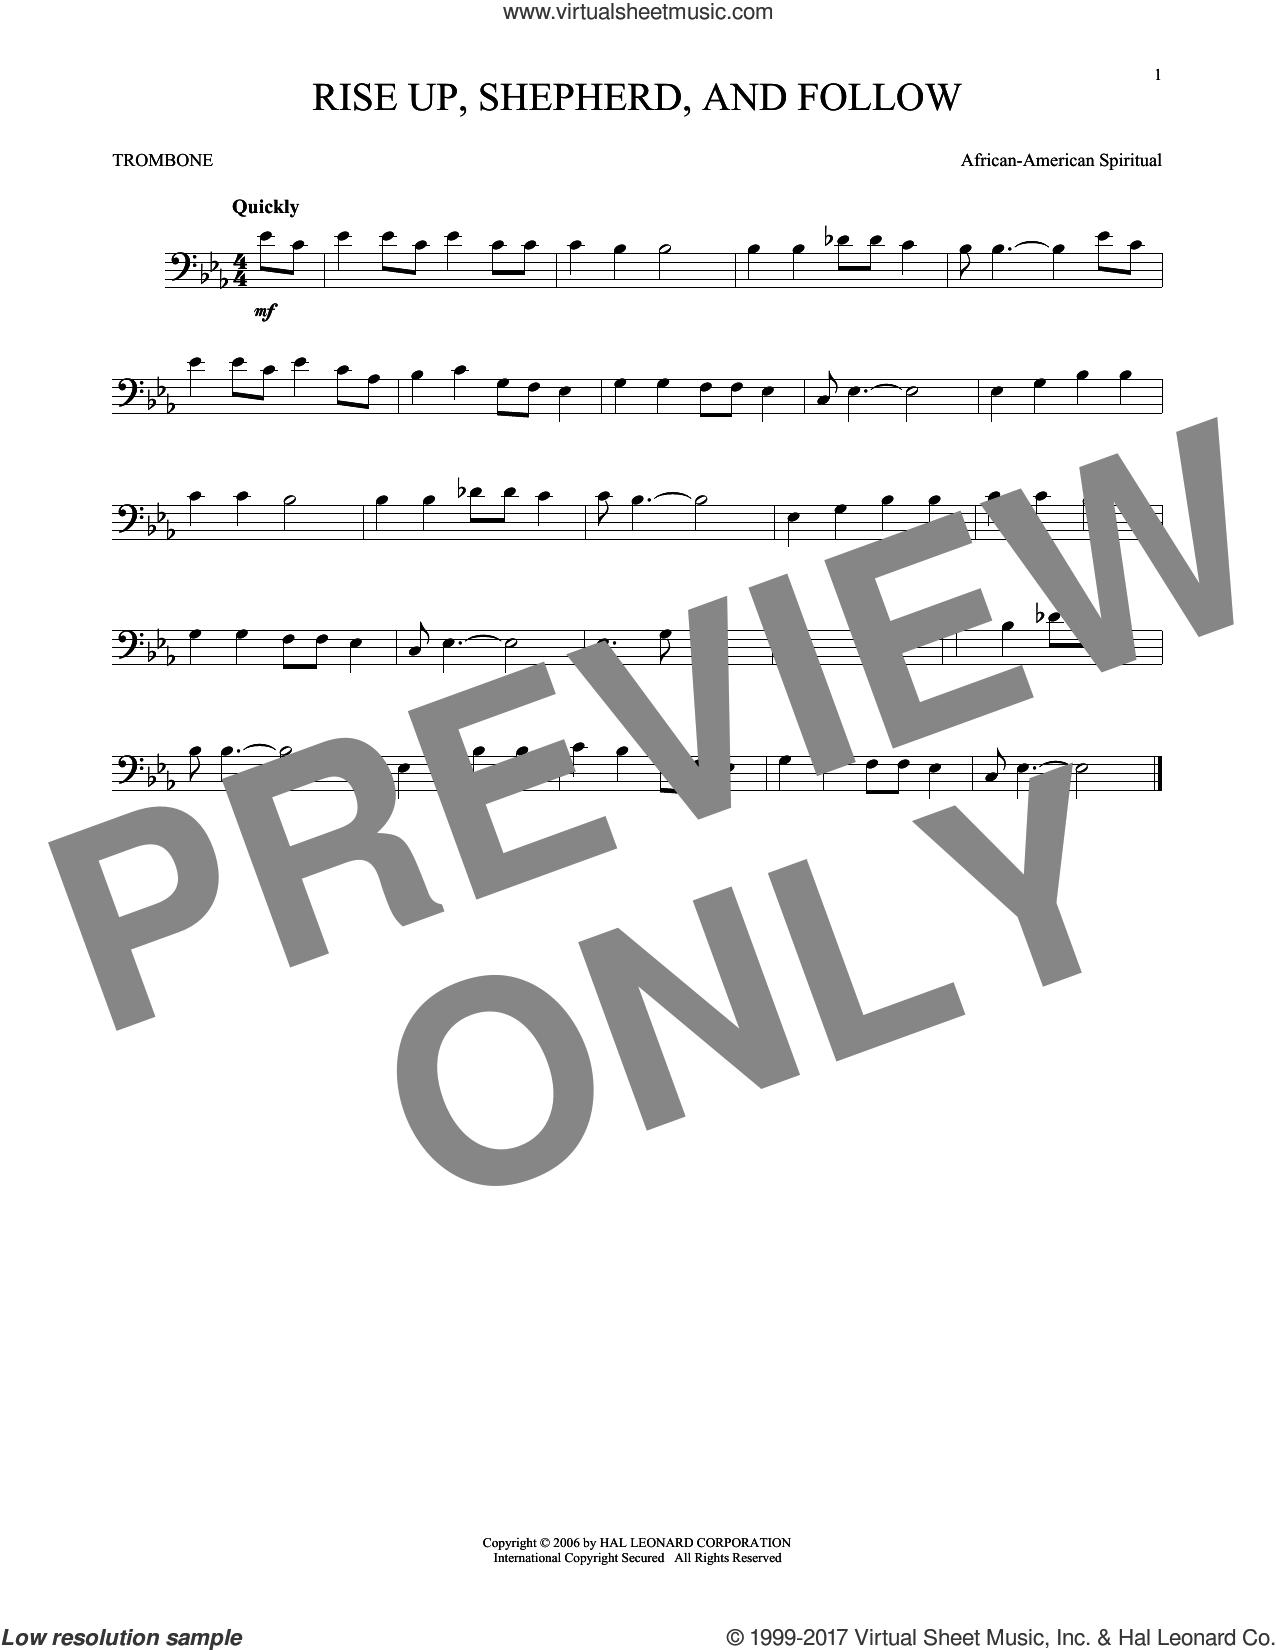 Rise Up, Shepherd, And Follow sheet music for trombone solo, intermediate skill level